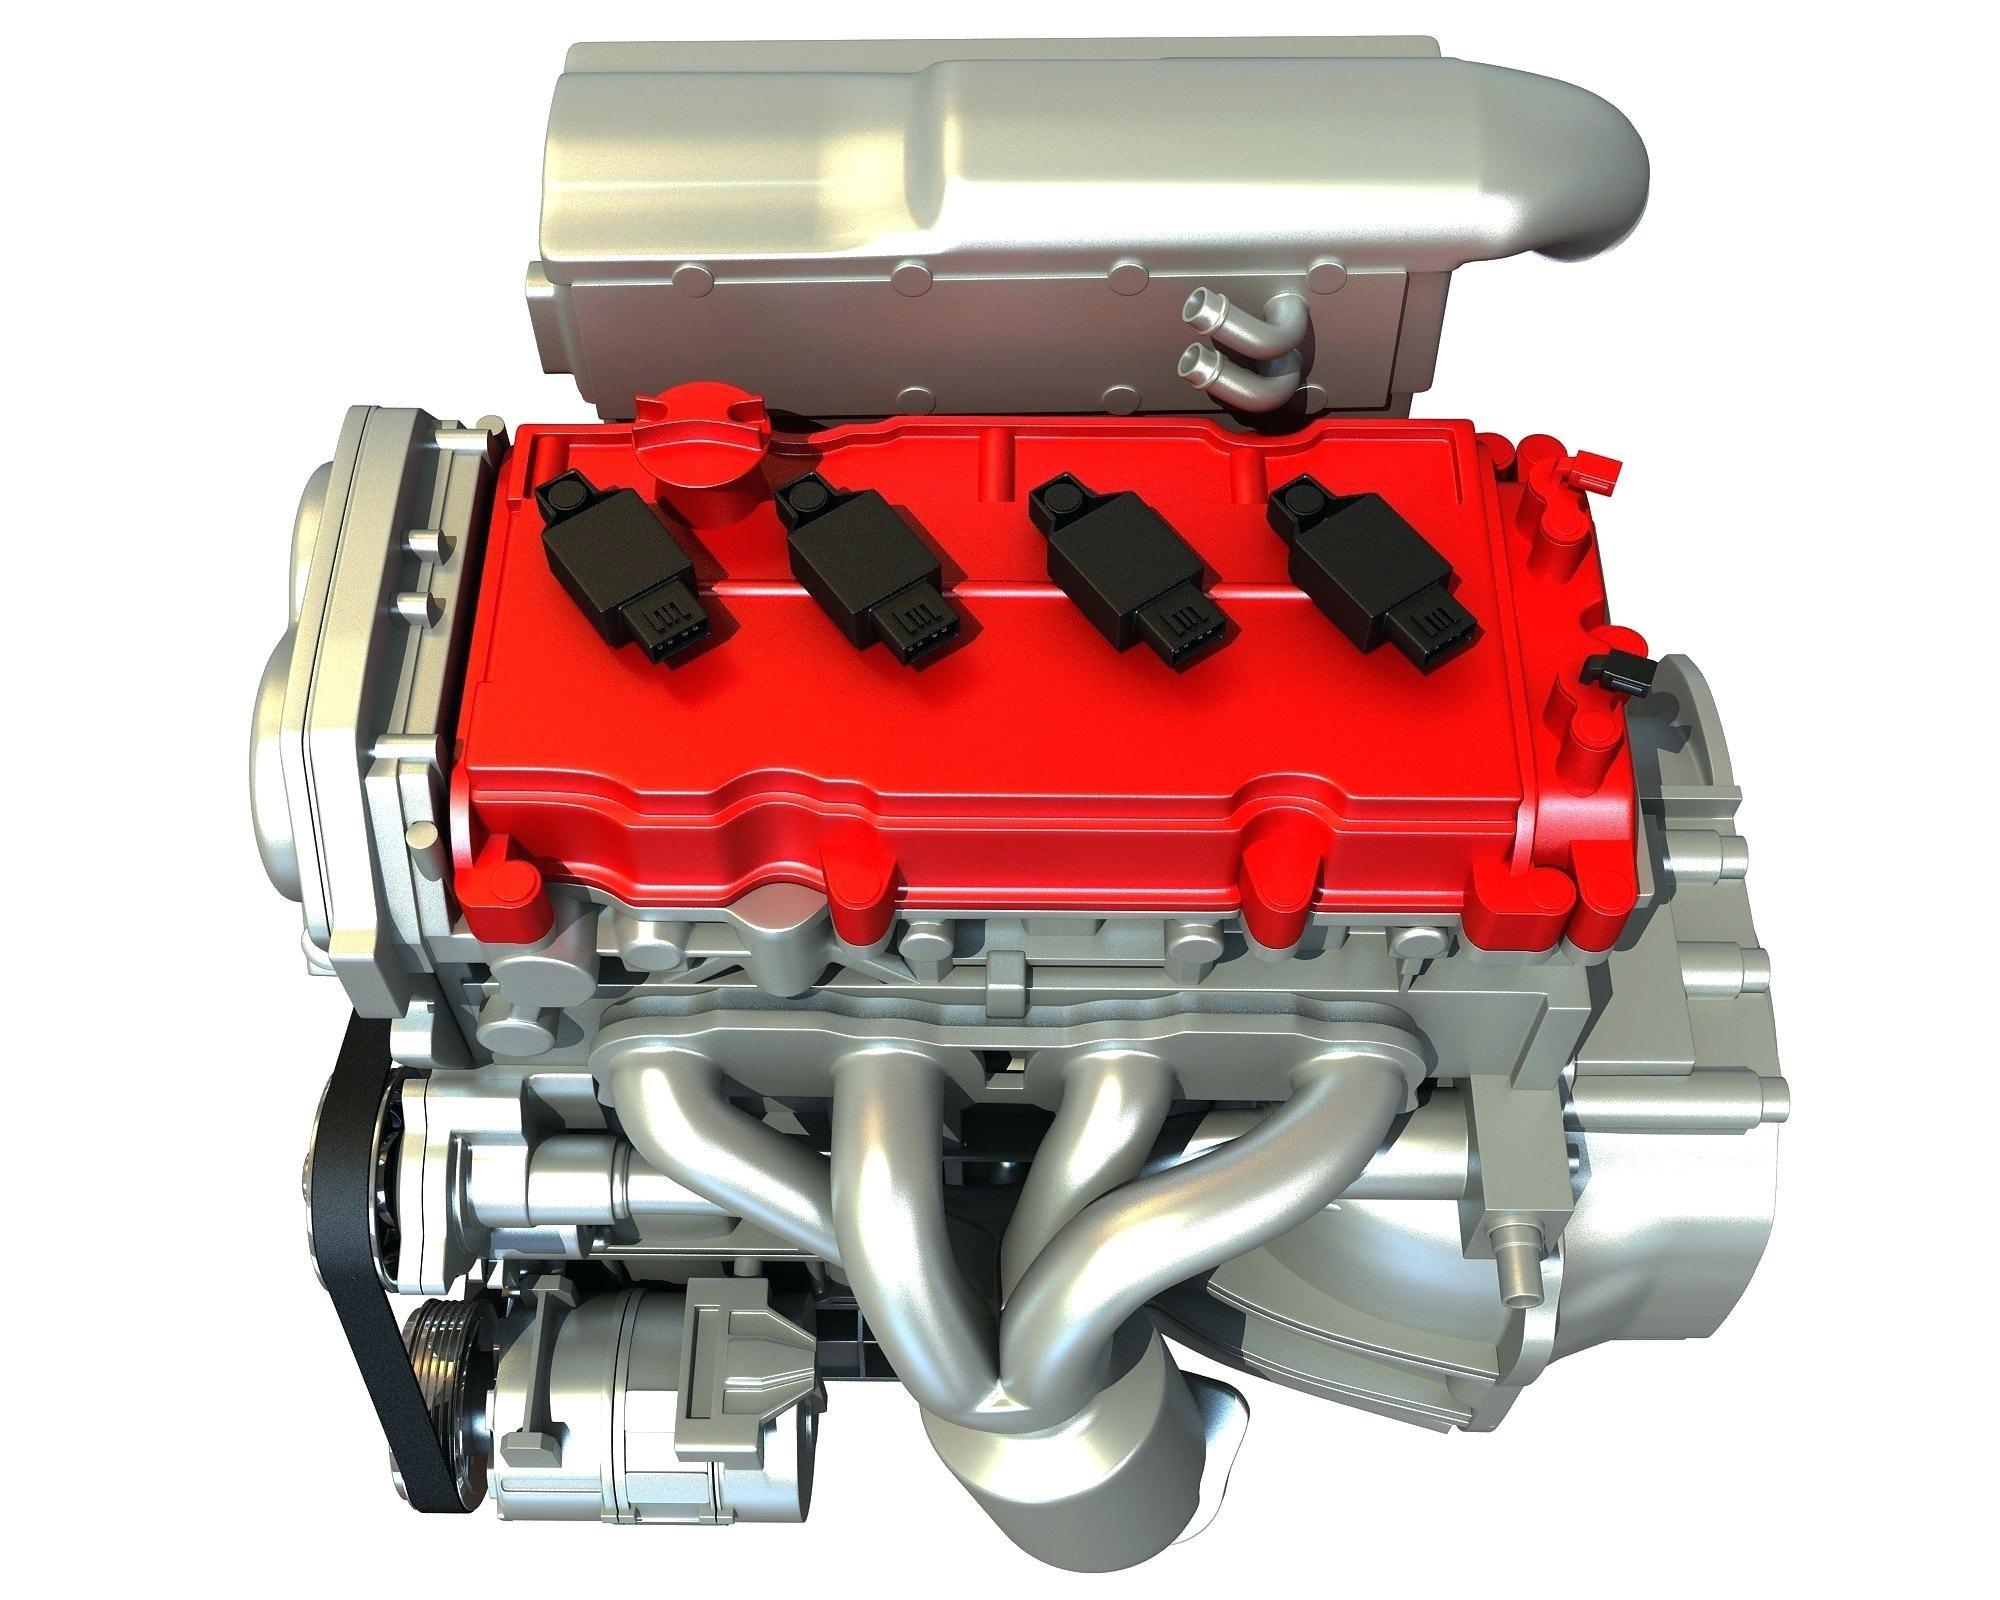 1995 toyota camry engine diagram mitsubishi canter wiring diagrams 99 stunning